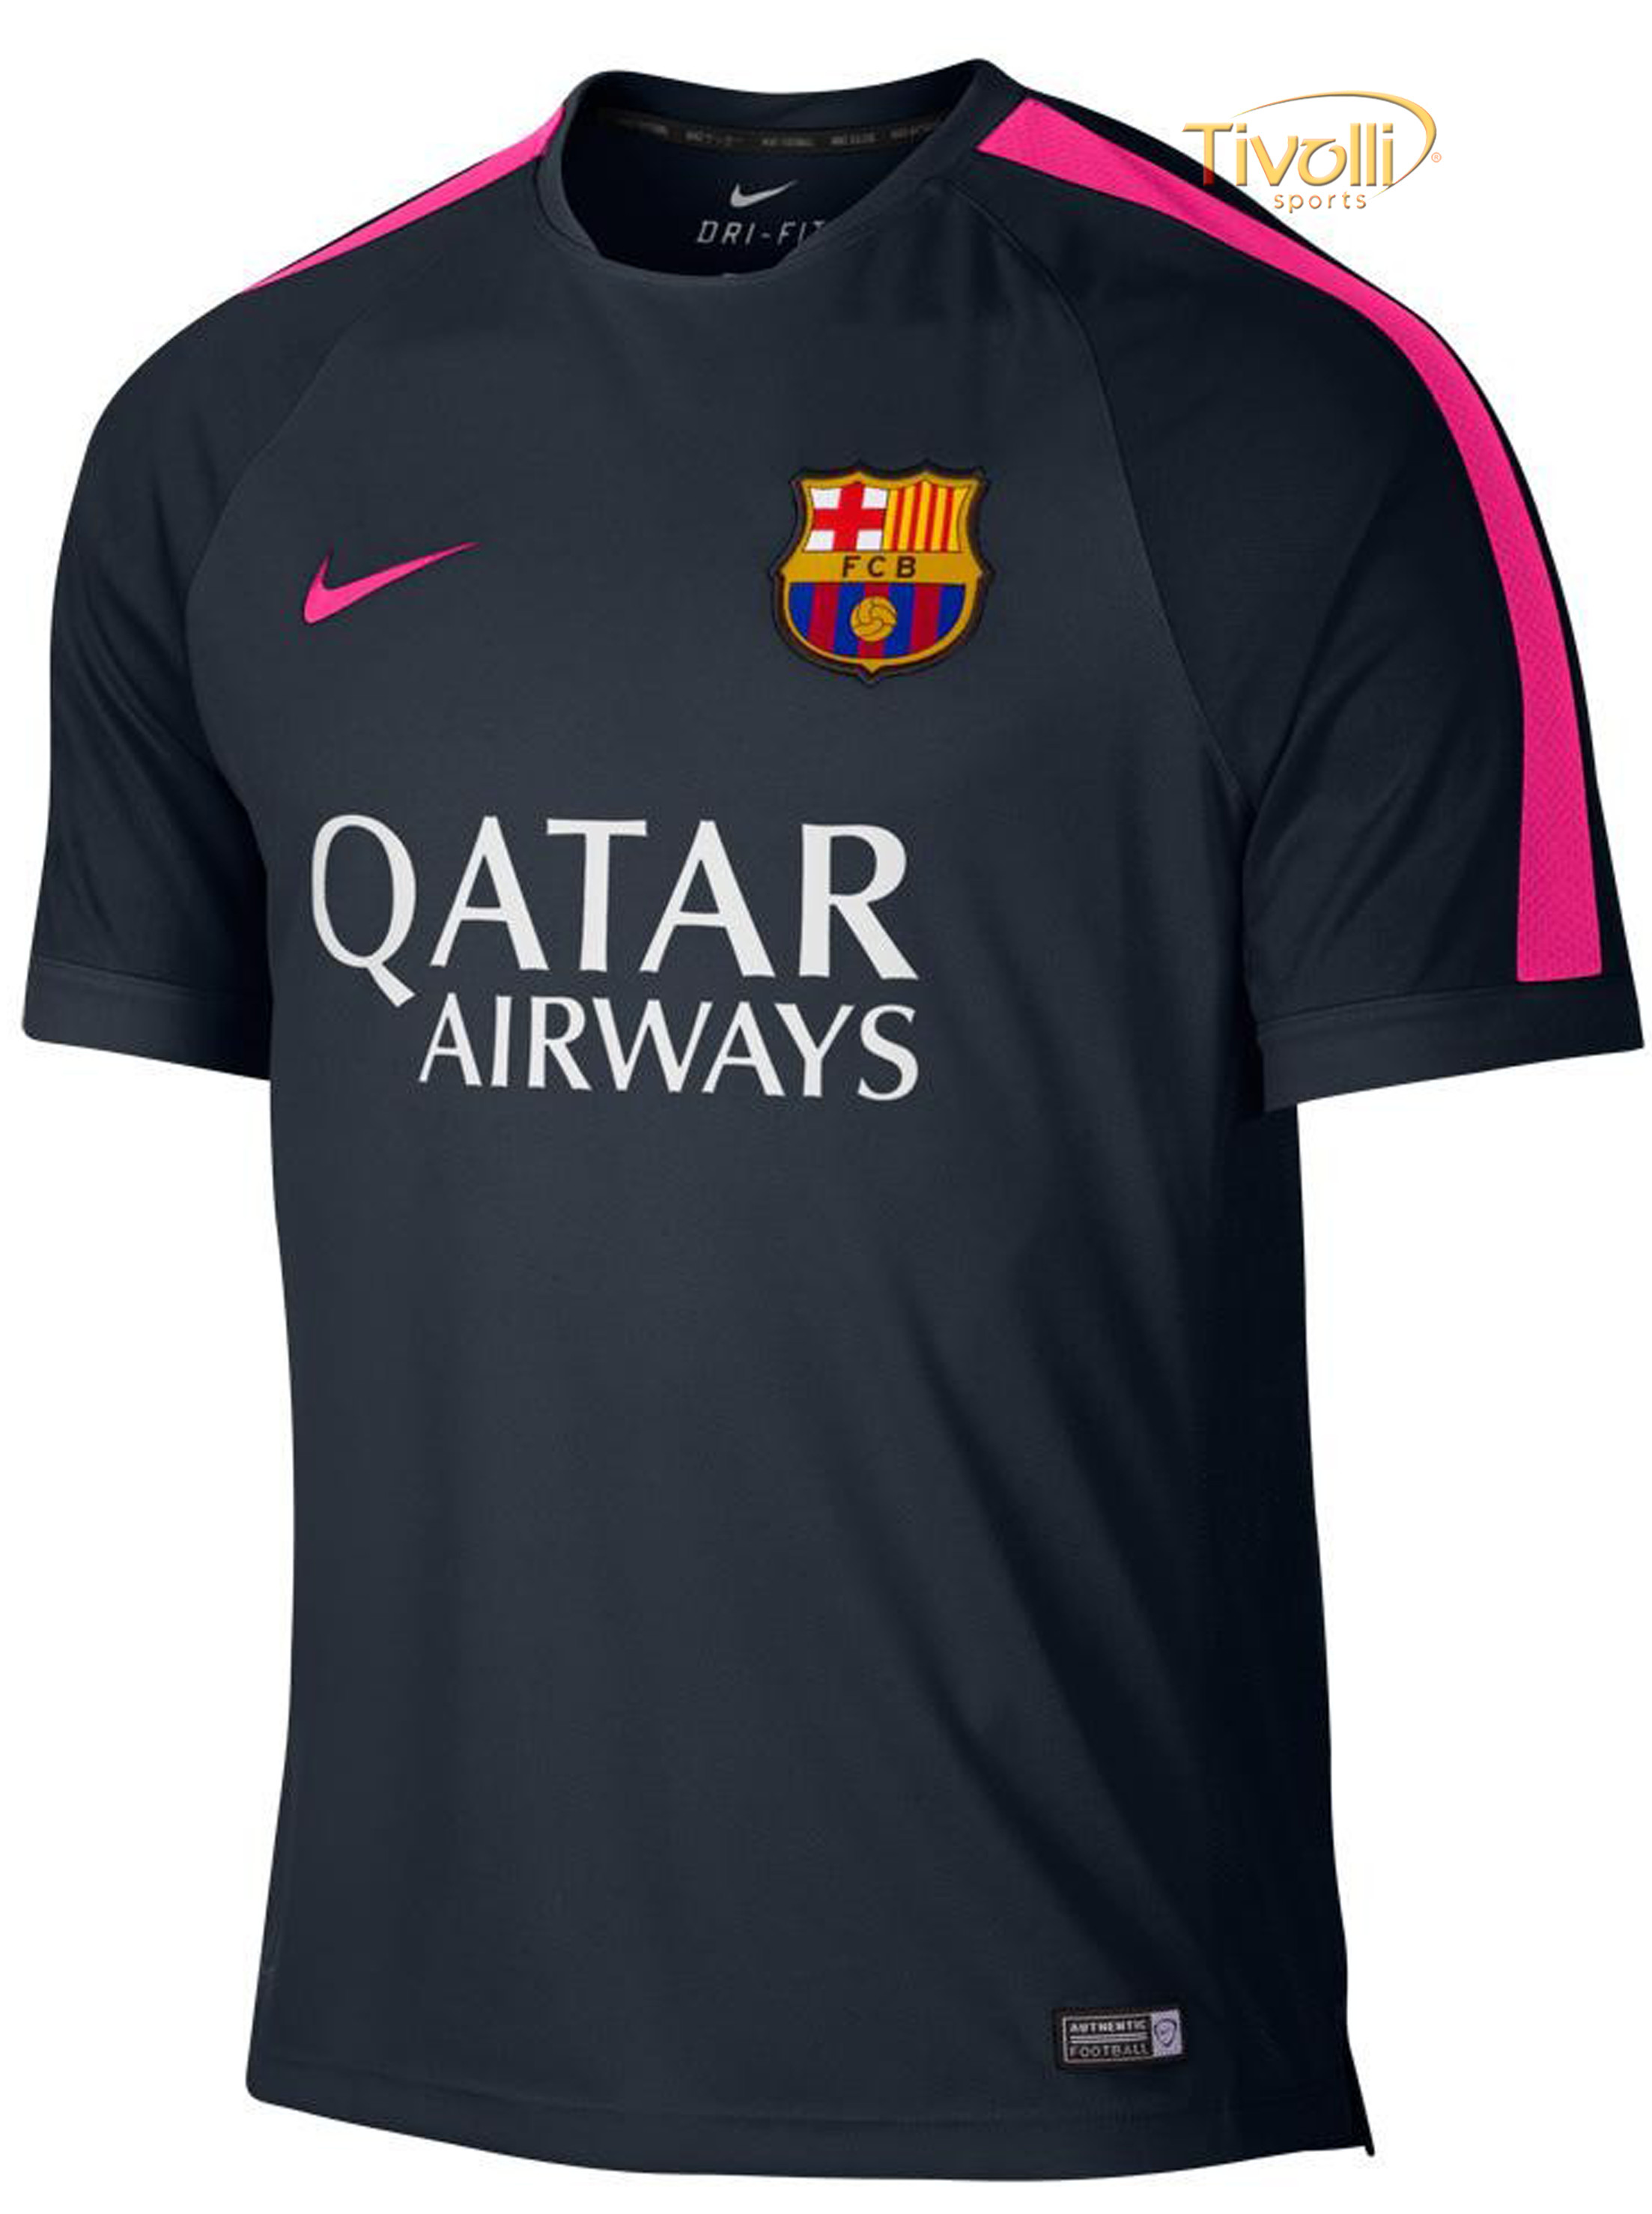 3f0f398b3b Black Friday - Camisa Nike FC Barcelona Treino Masculina Azul Marinho e Rosa